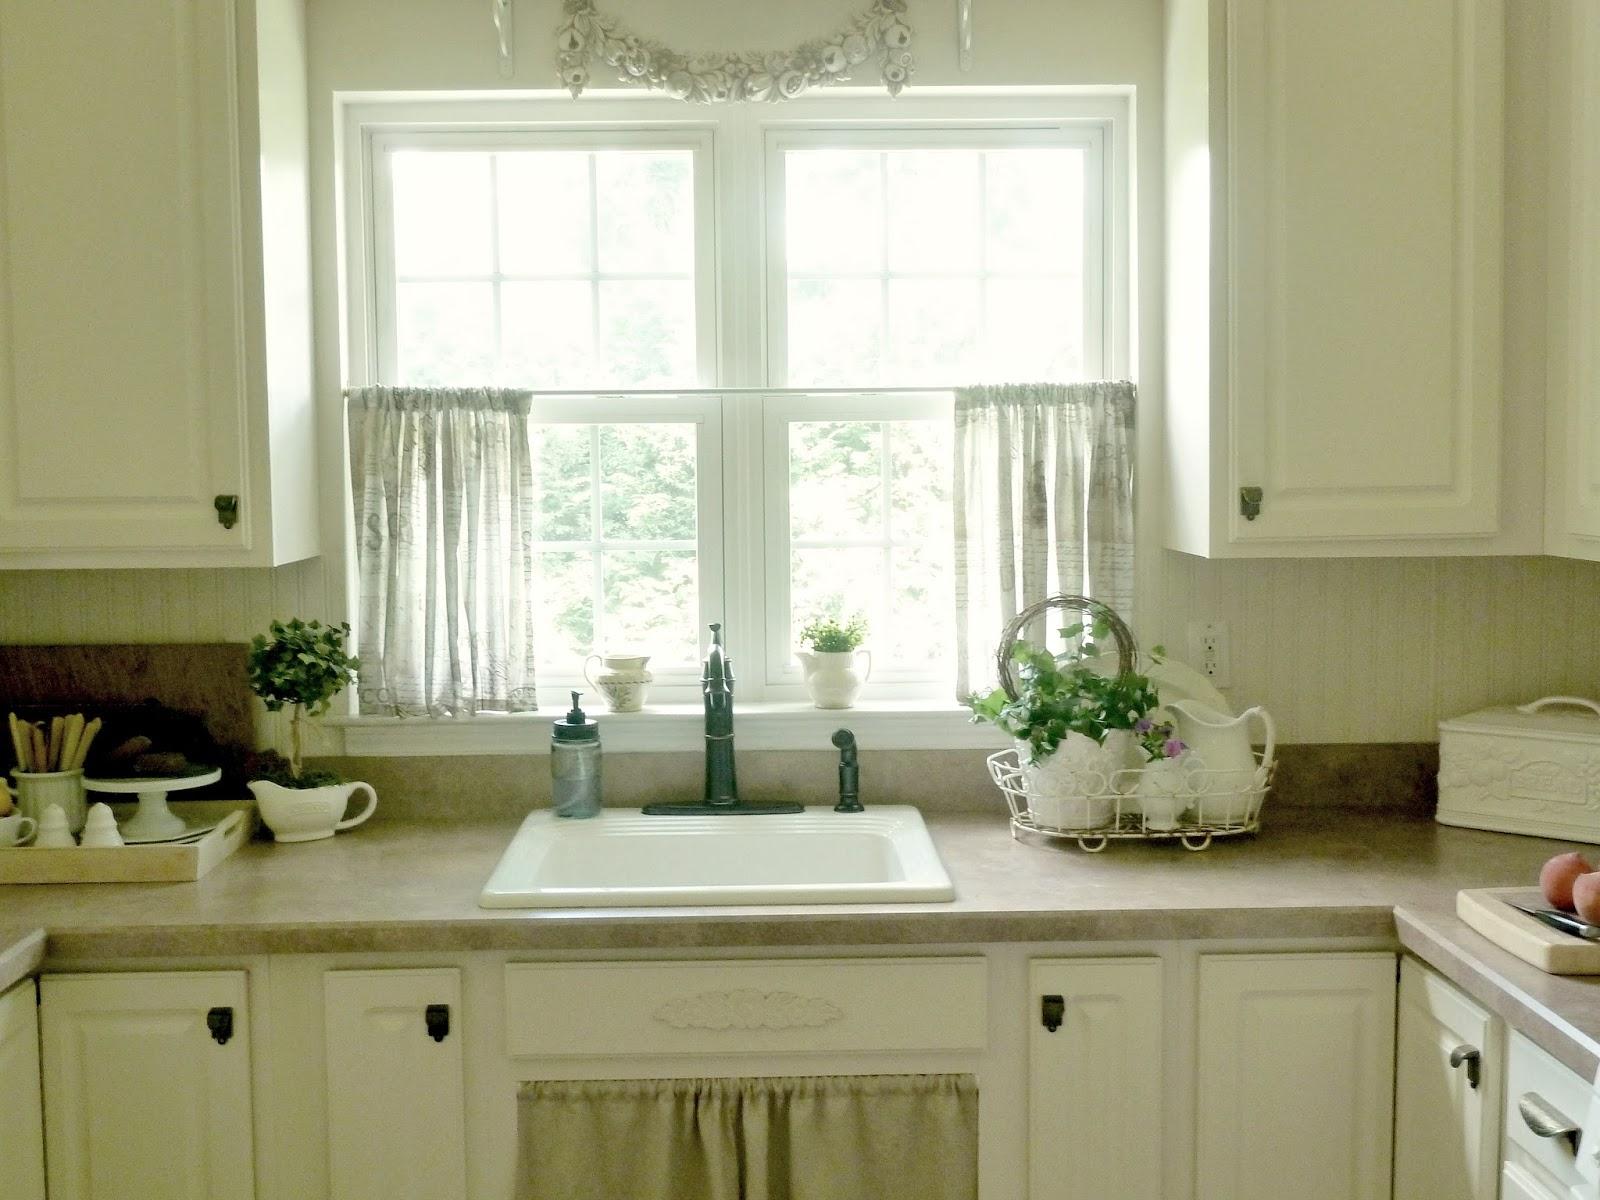 modern-mutfak-perdesi-seciminde-dikkat-edilmesi-mutfak-perdesi-secerken-dikkat-etmeniz-gerekenler-4 Mutfak perdesi seçerken dikkat etmeniz gerekenler